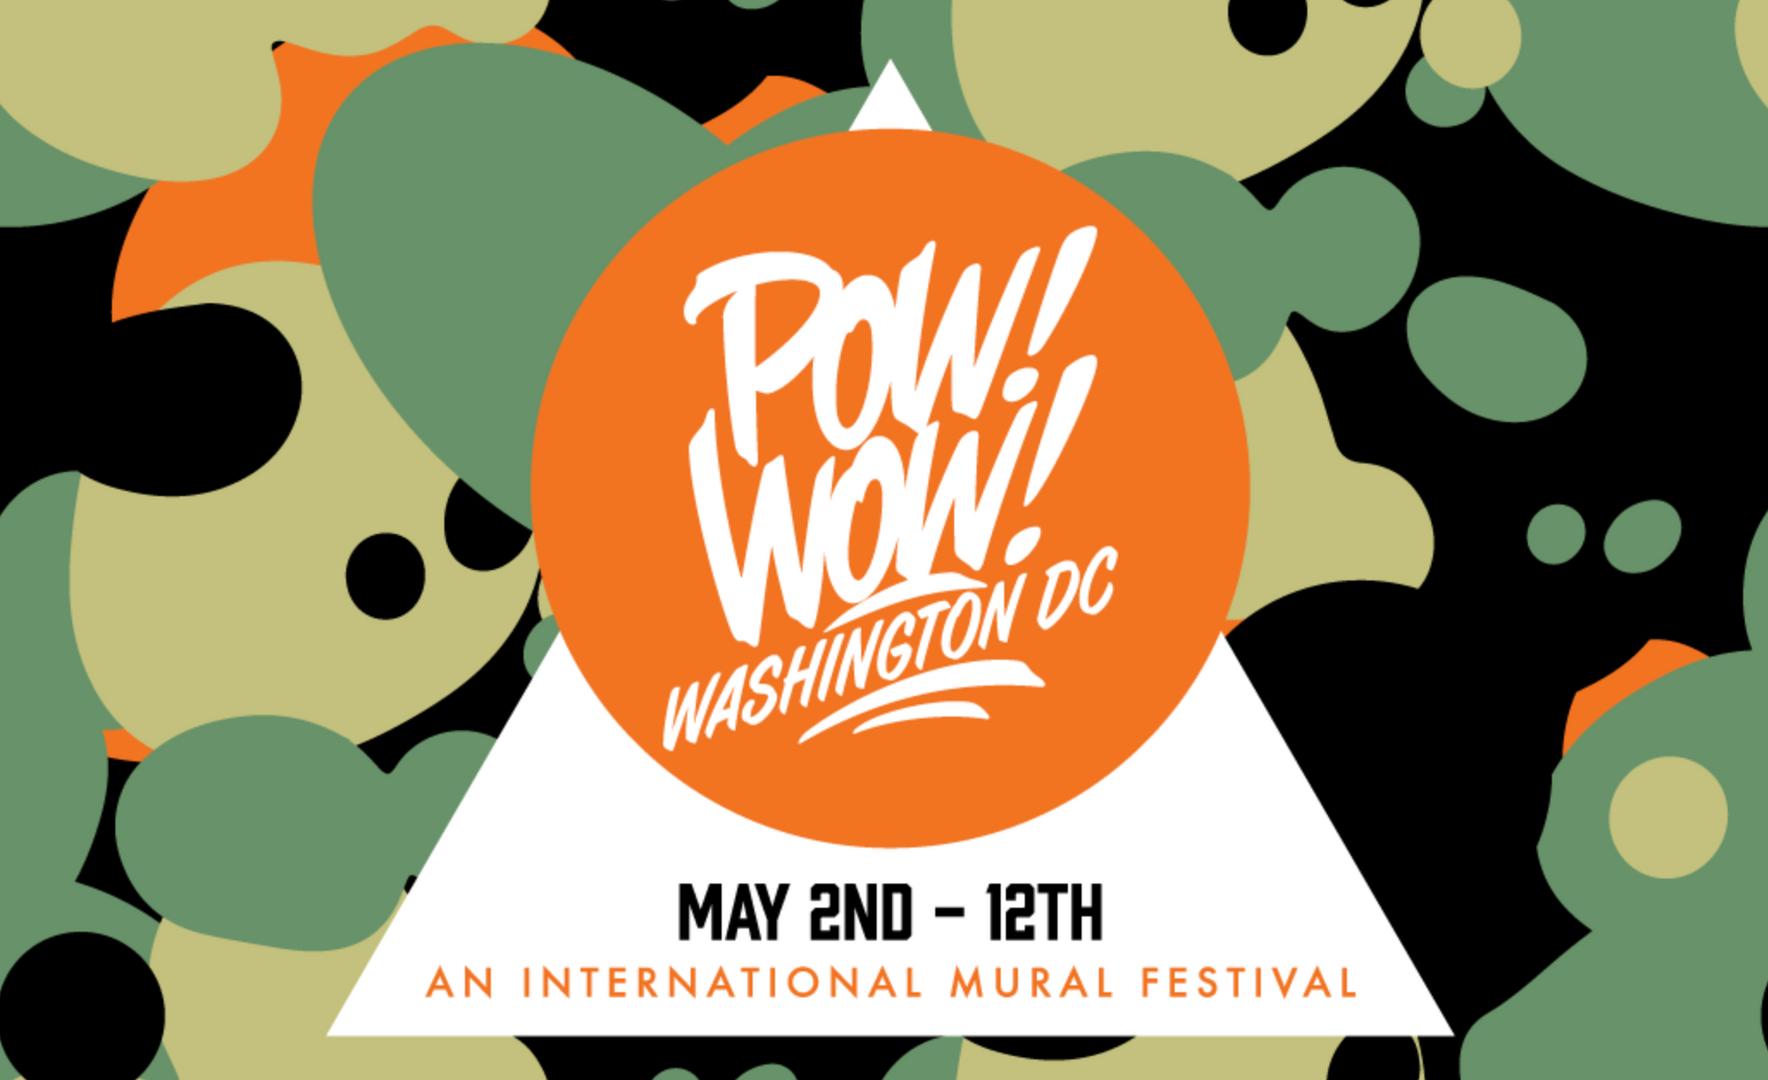 official POW!WOW!DC logo